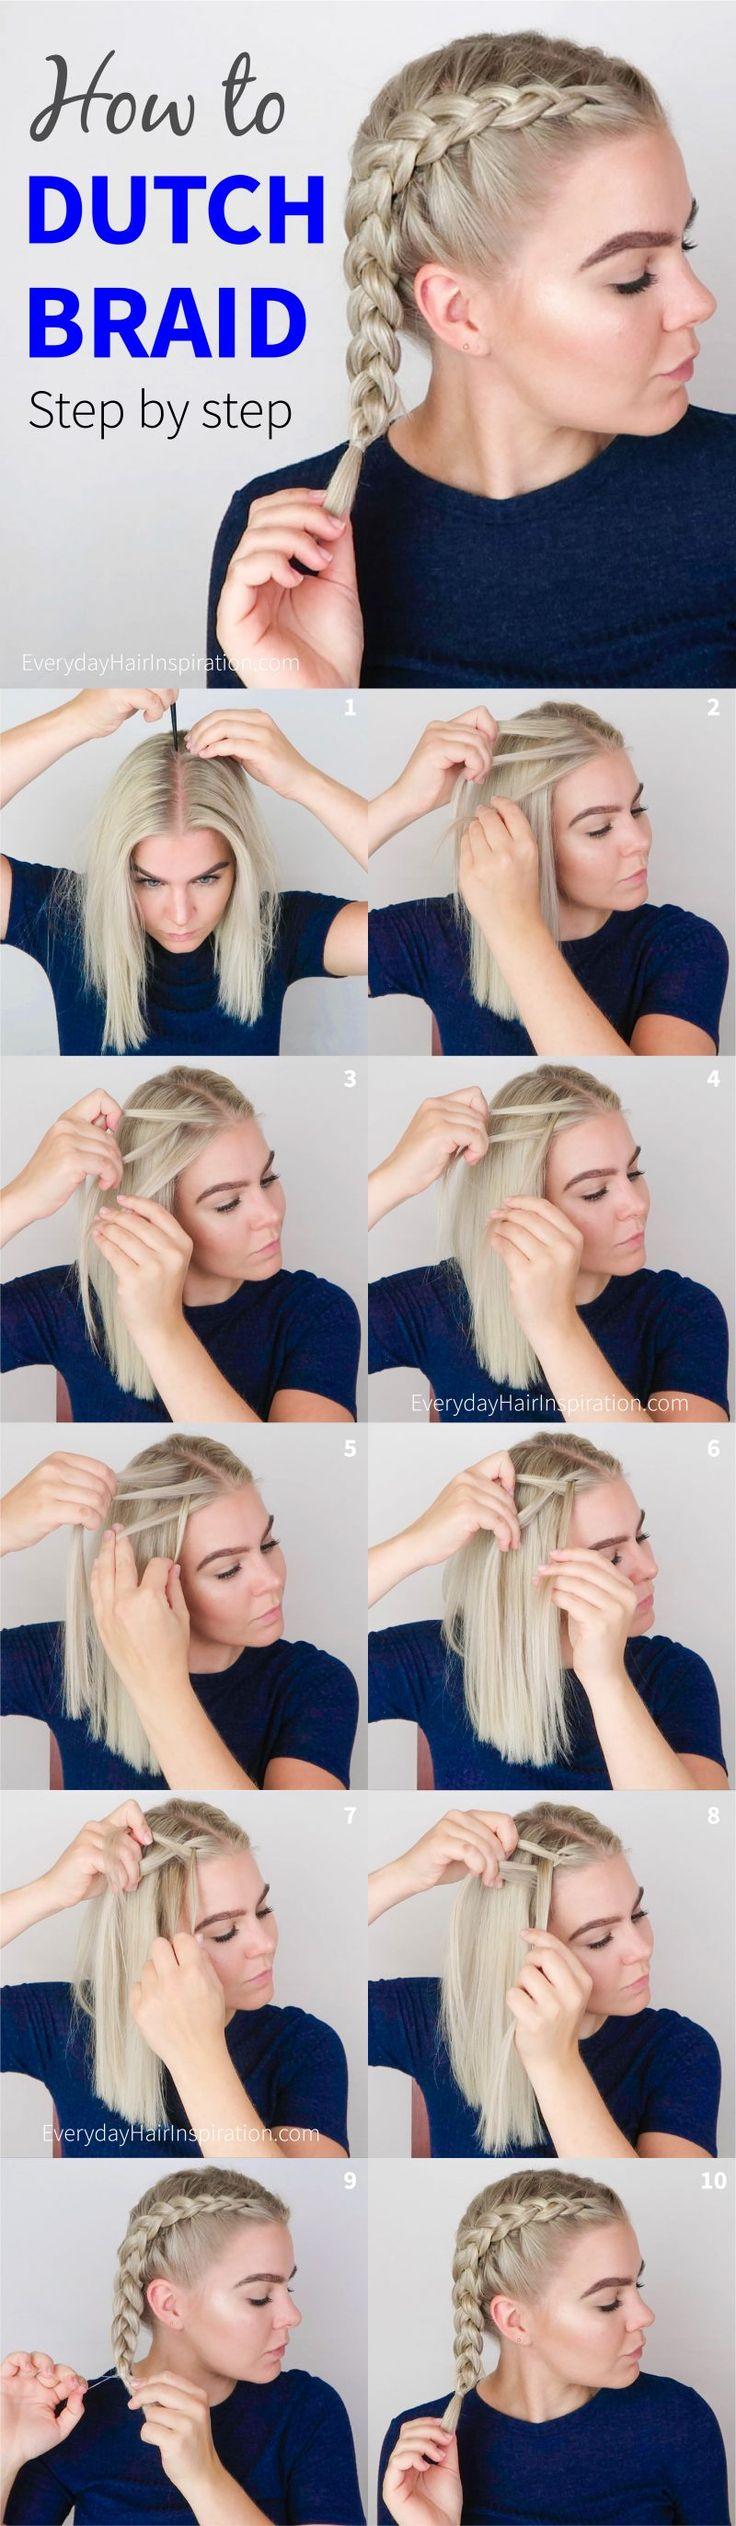 How to dutch braid step by step